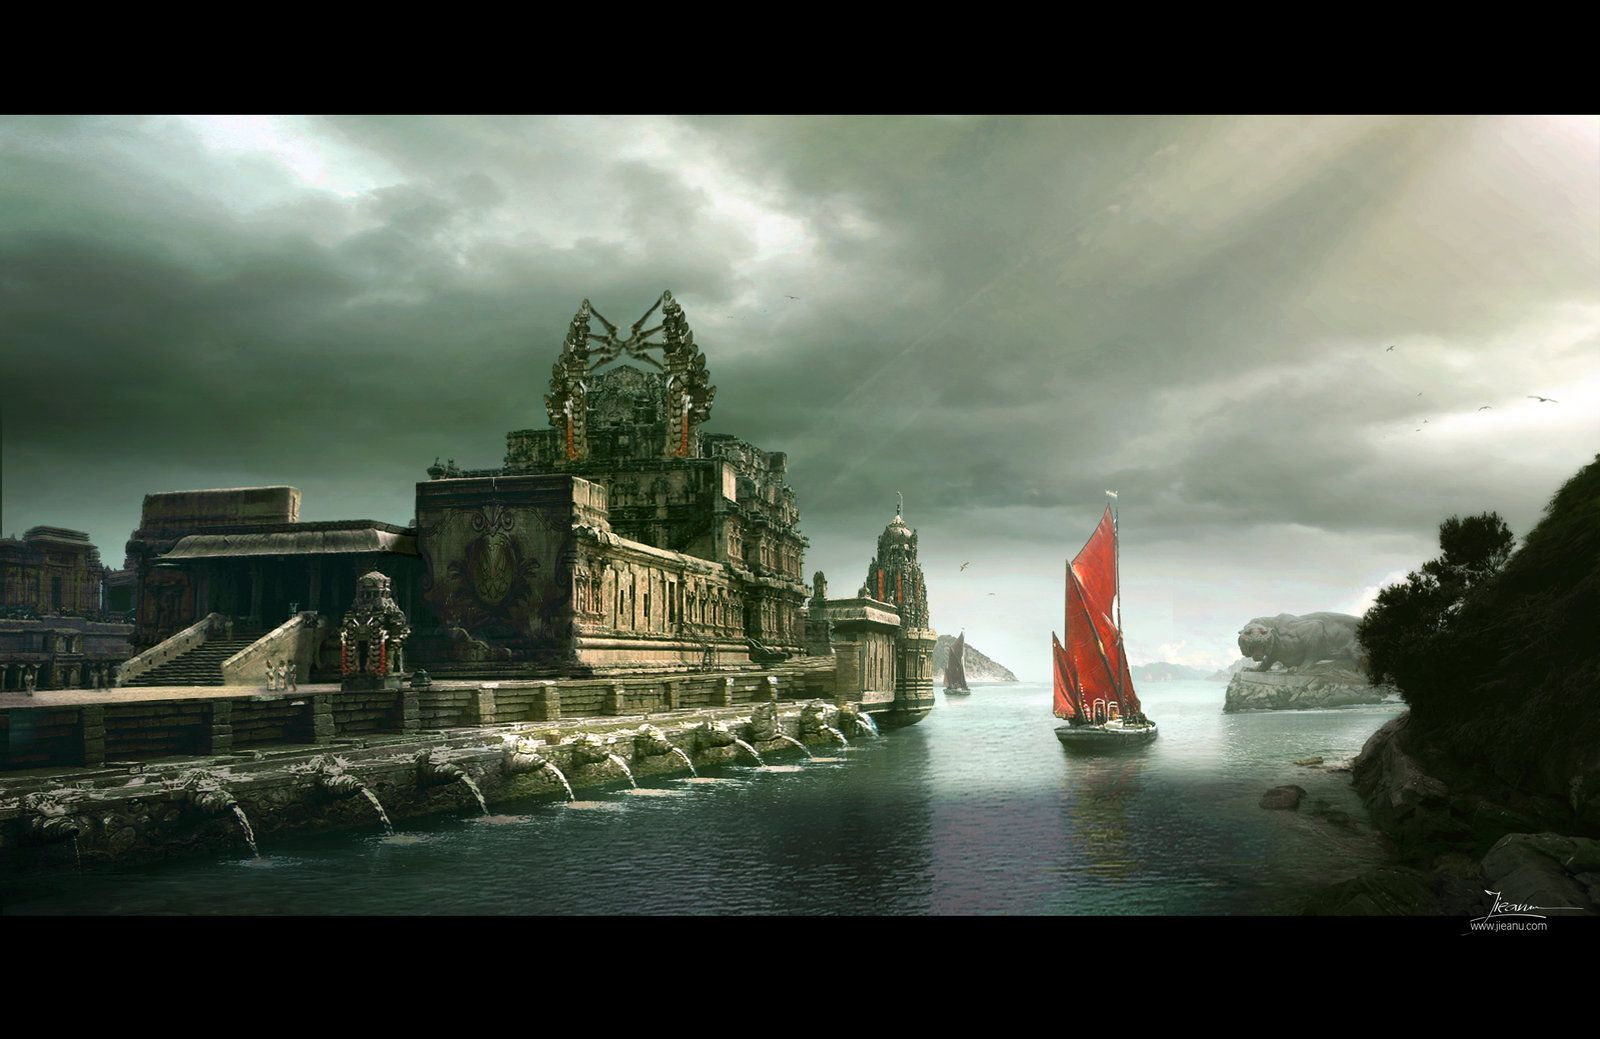 Red Boat, Dragos Jieanu on ArtStation at http://www.artstation.com/artwork/red-boat